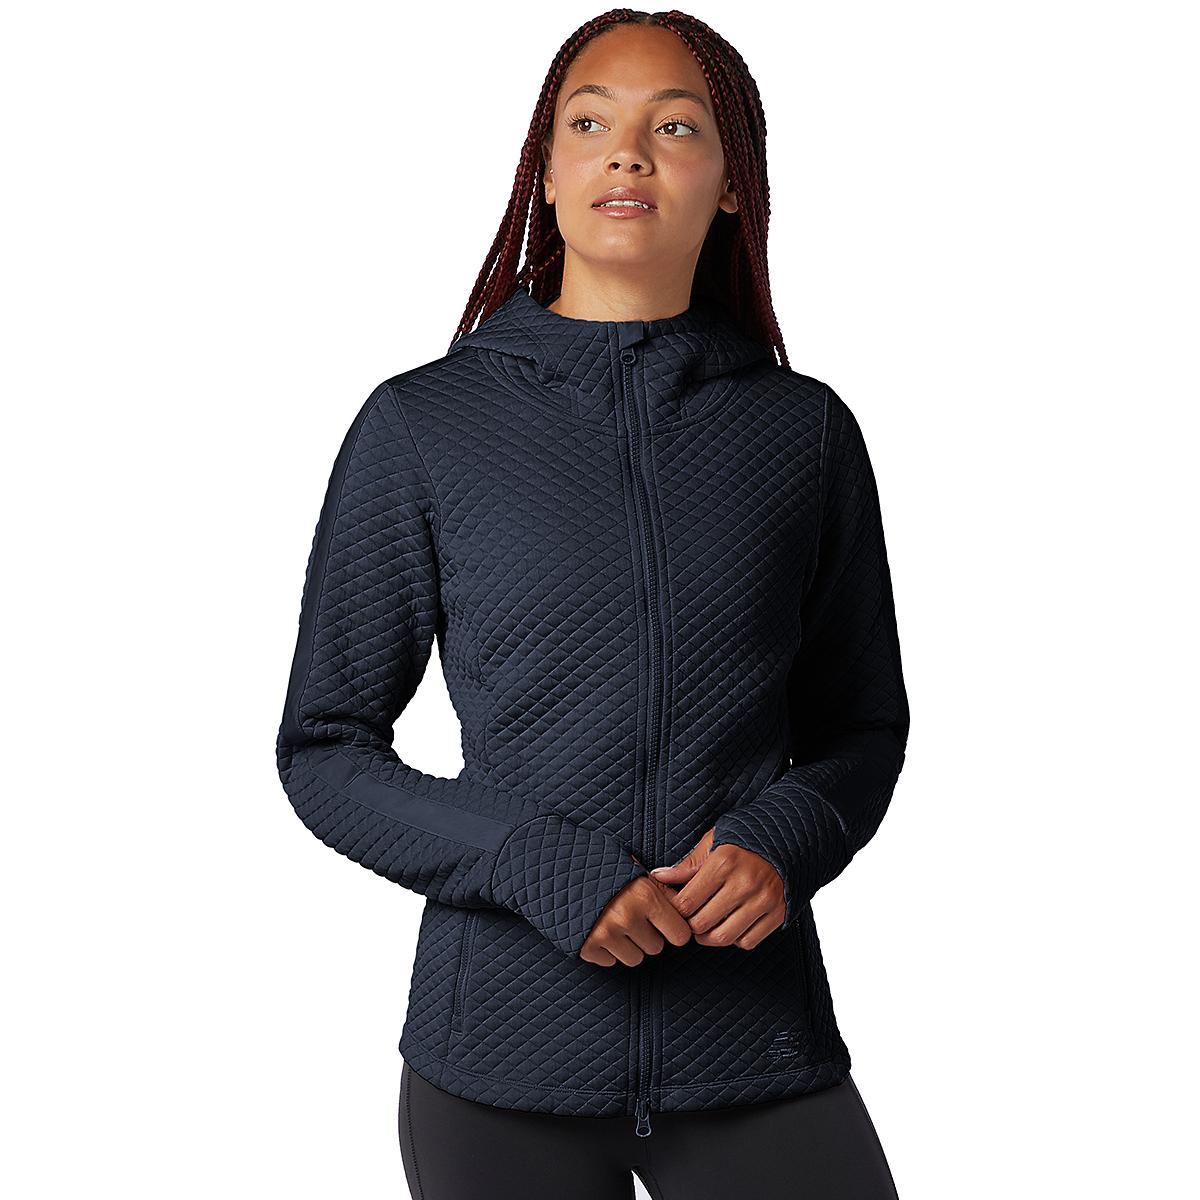 Women's New Balance Heatloft Jacket - Color: Eclipse Heather - Size: XS, Eclipse Heather, large, image 1